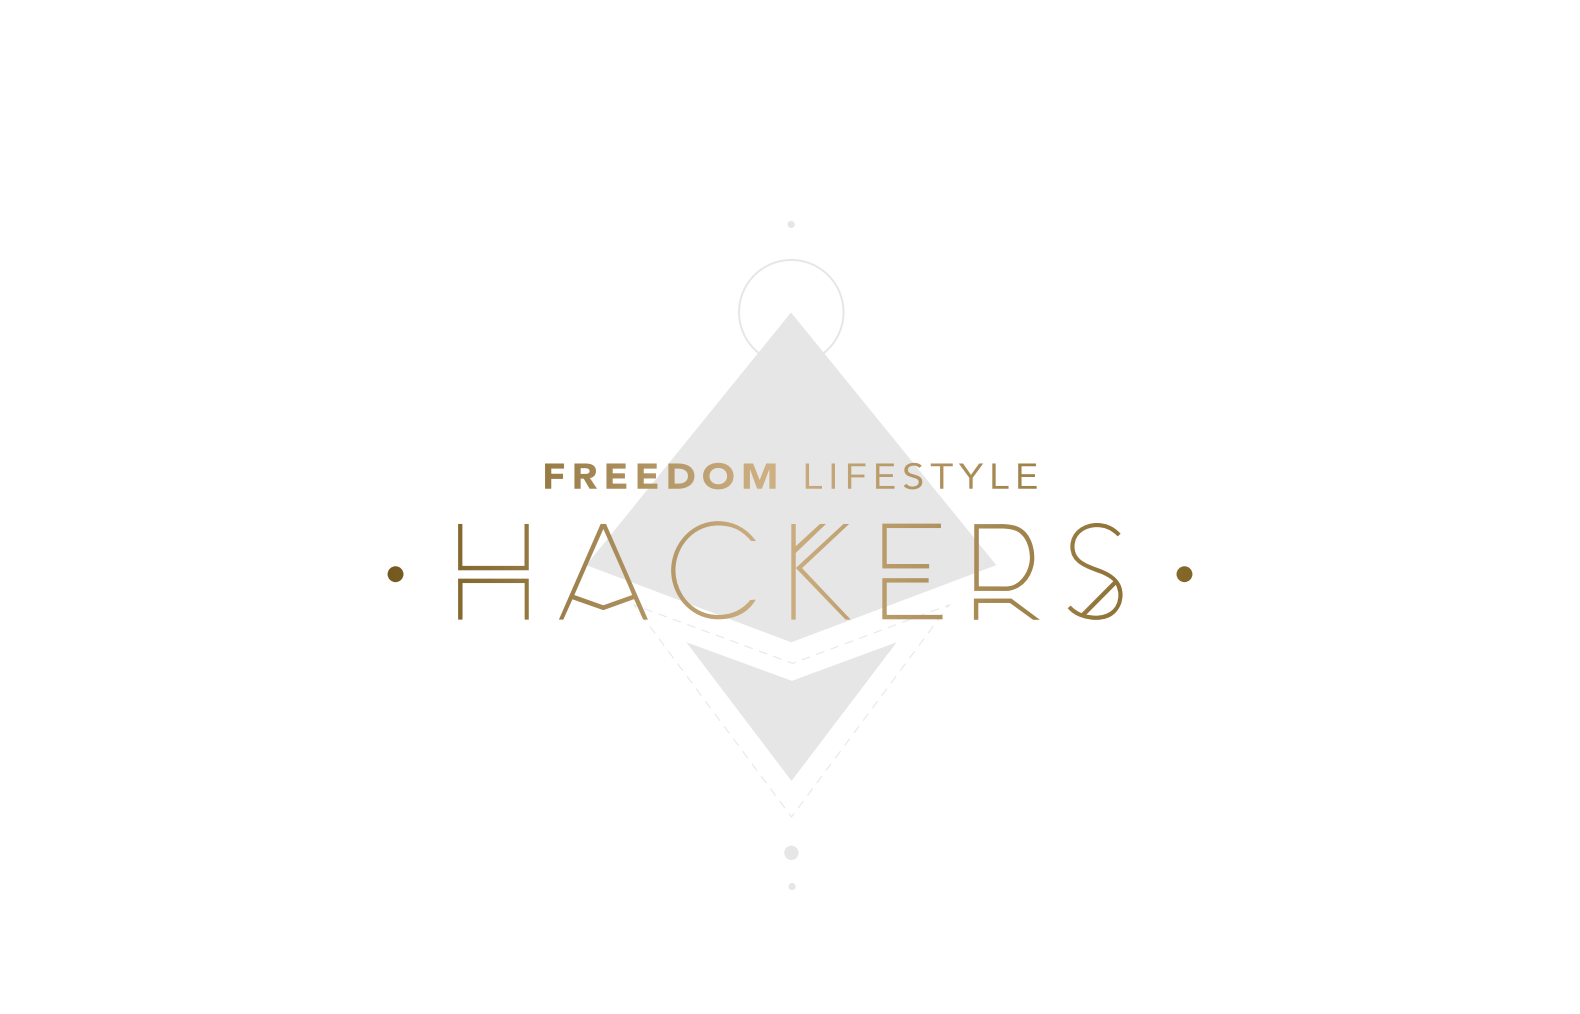 Freedom Lifestyle Hackers - KH Creative